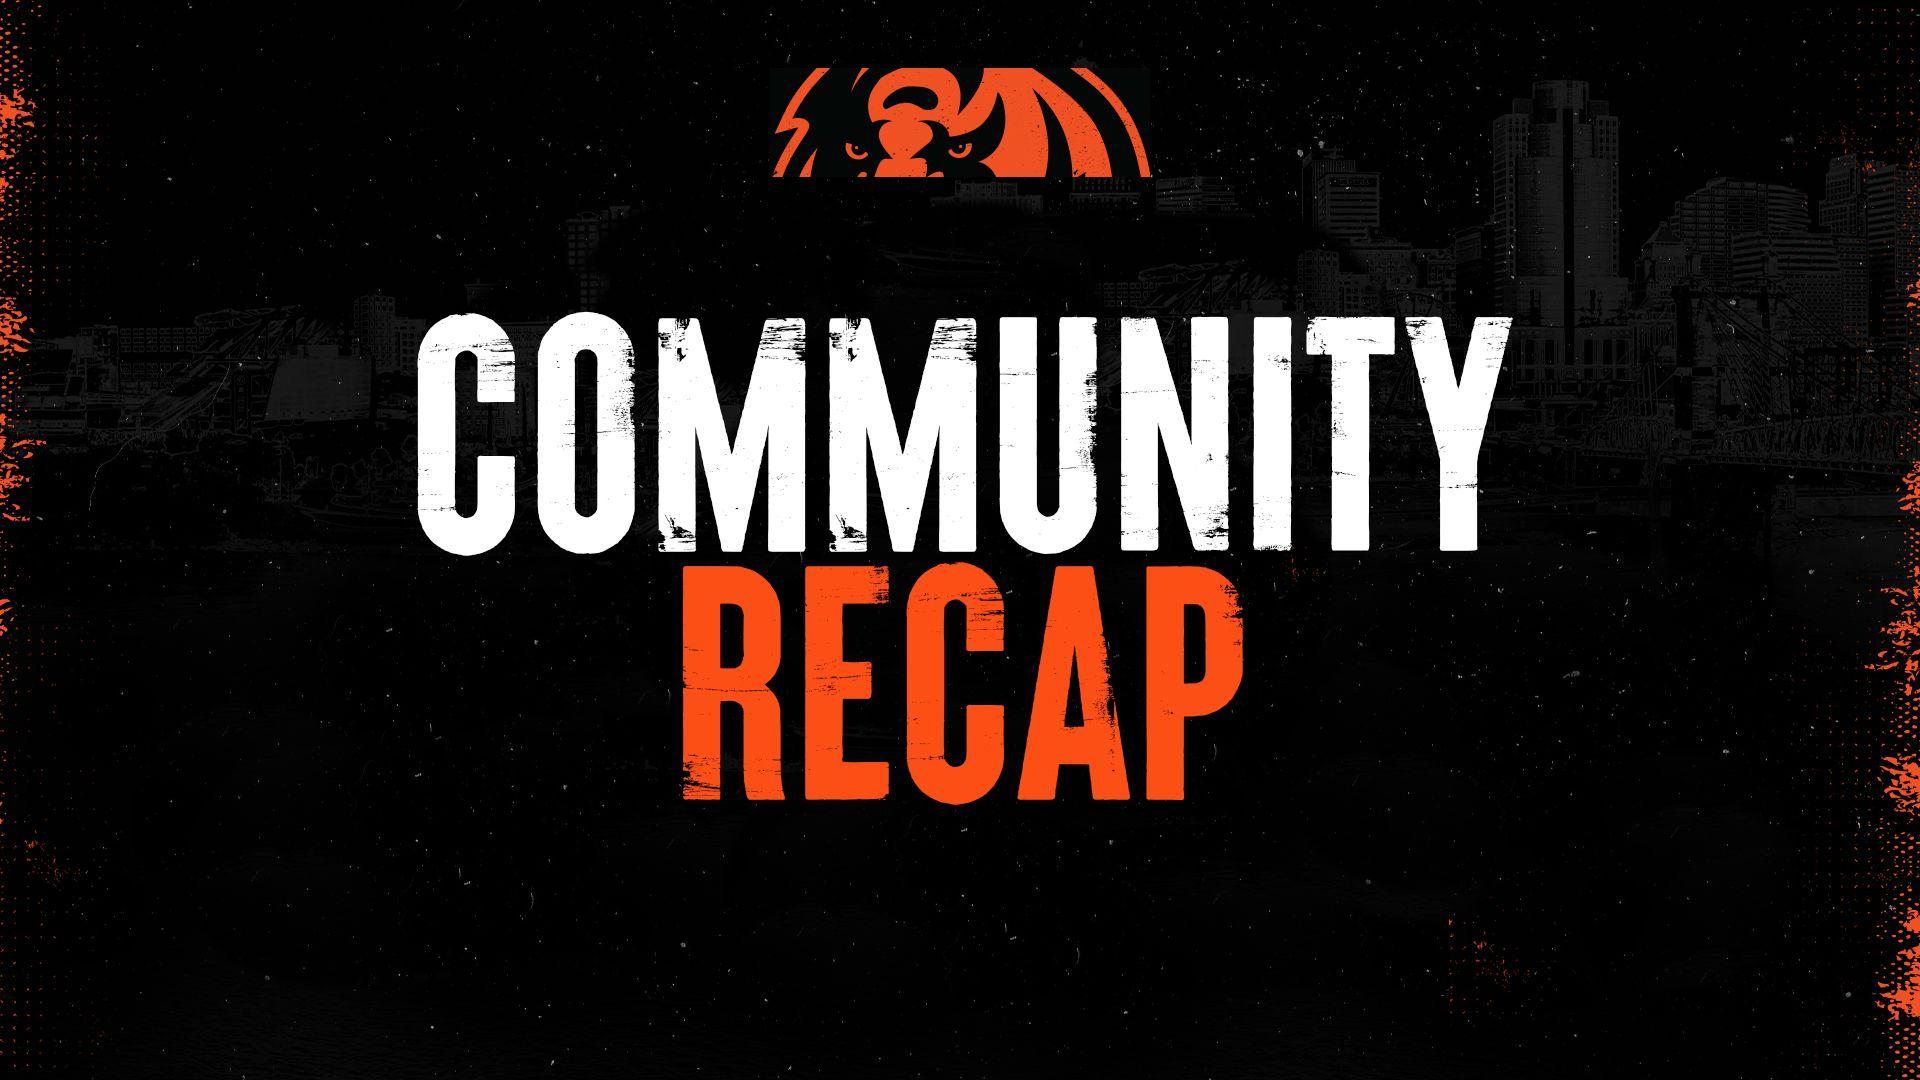 Community Recap